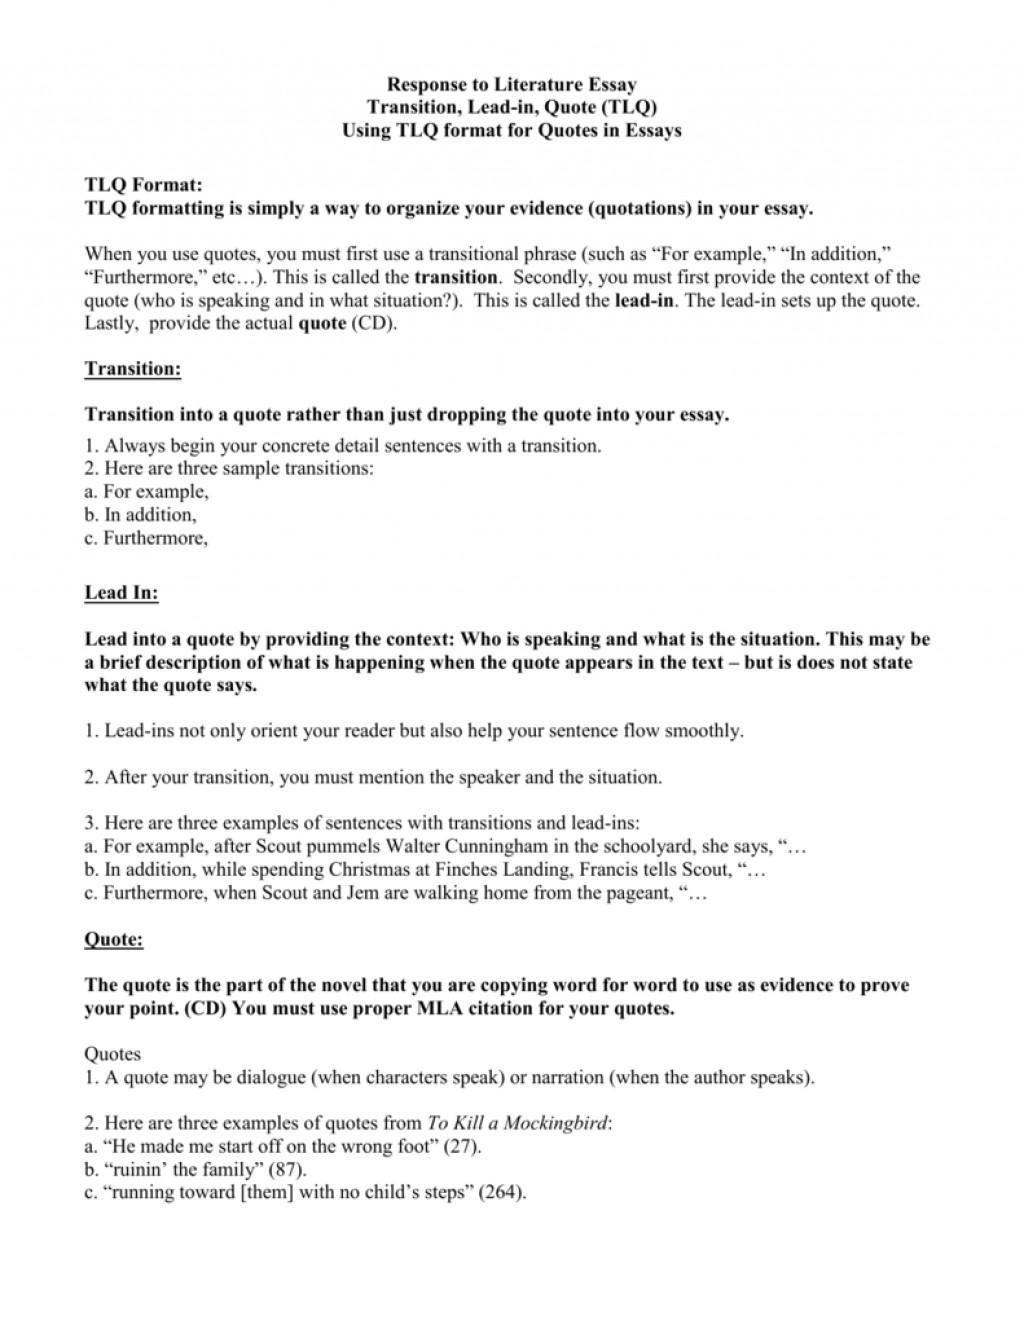 004 Lead Essay 008043813 1 Breathtaking Exposure Lex Competition Large